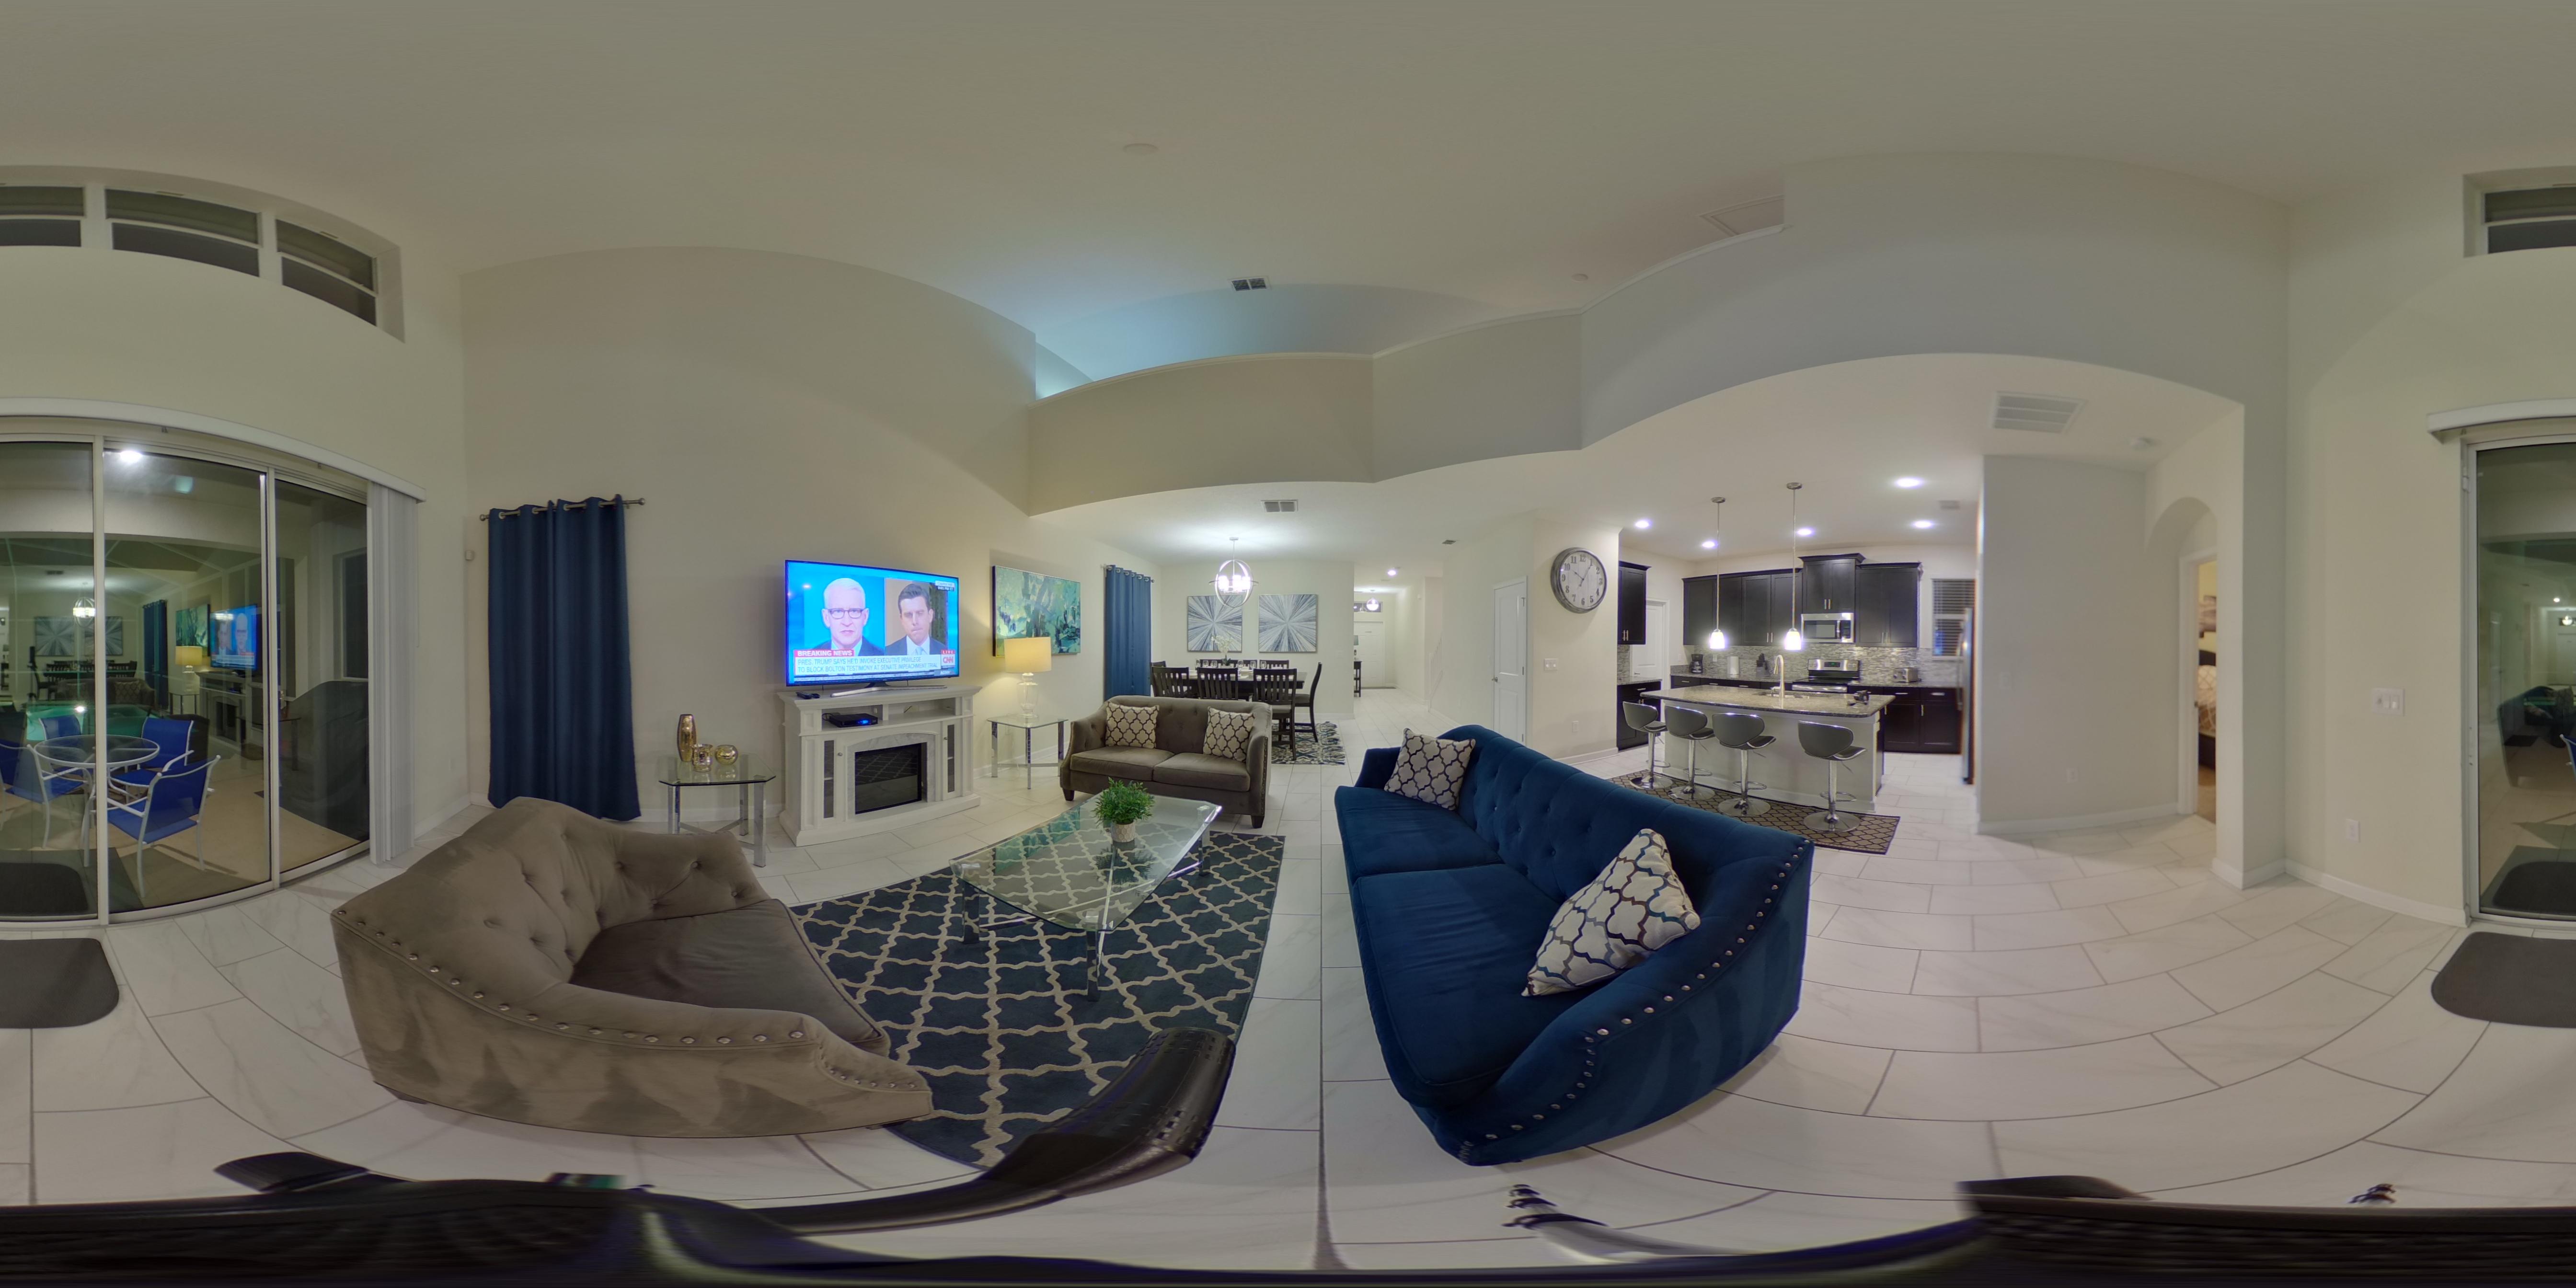 Apartment Villa  10 min from Disney  Golf  Wetpark all new photo 24719405